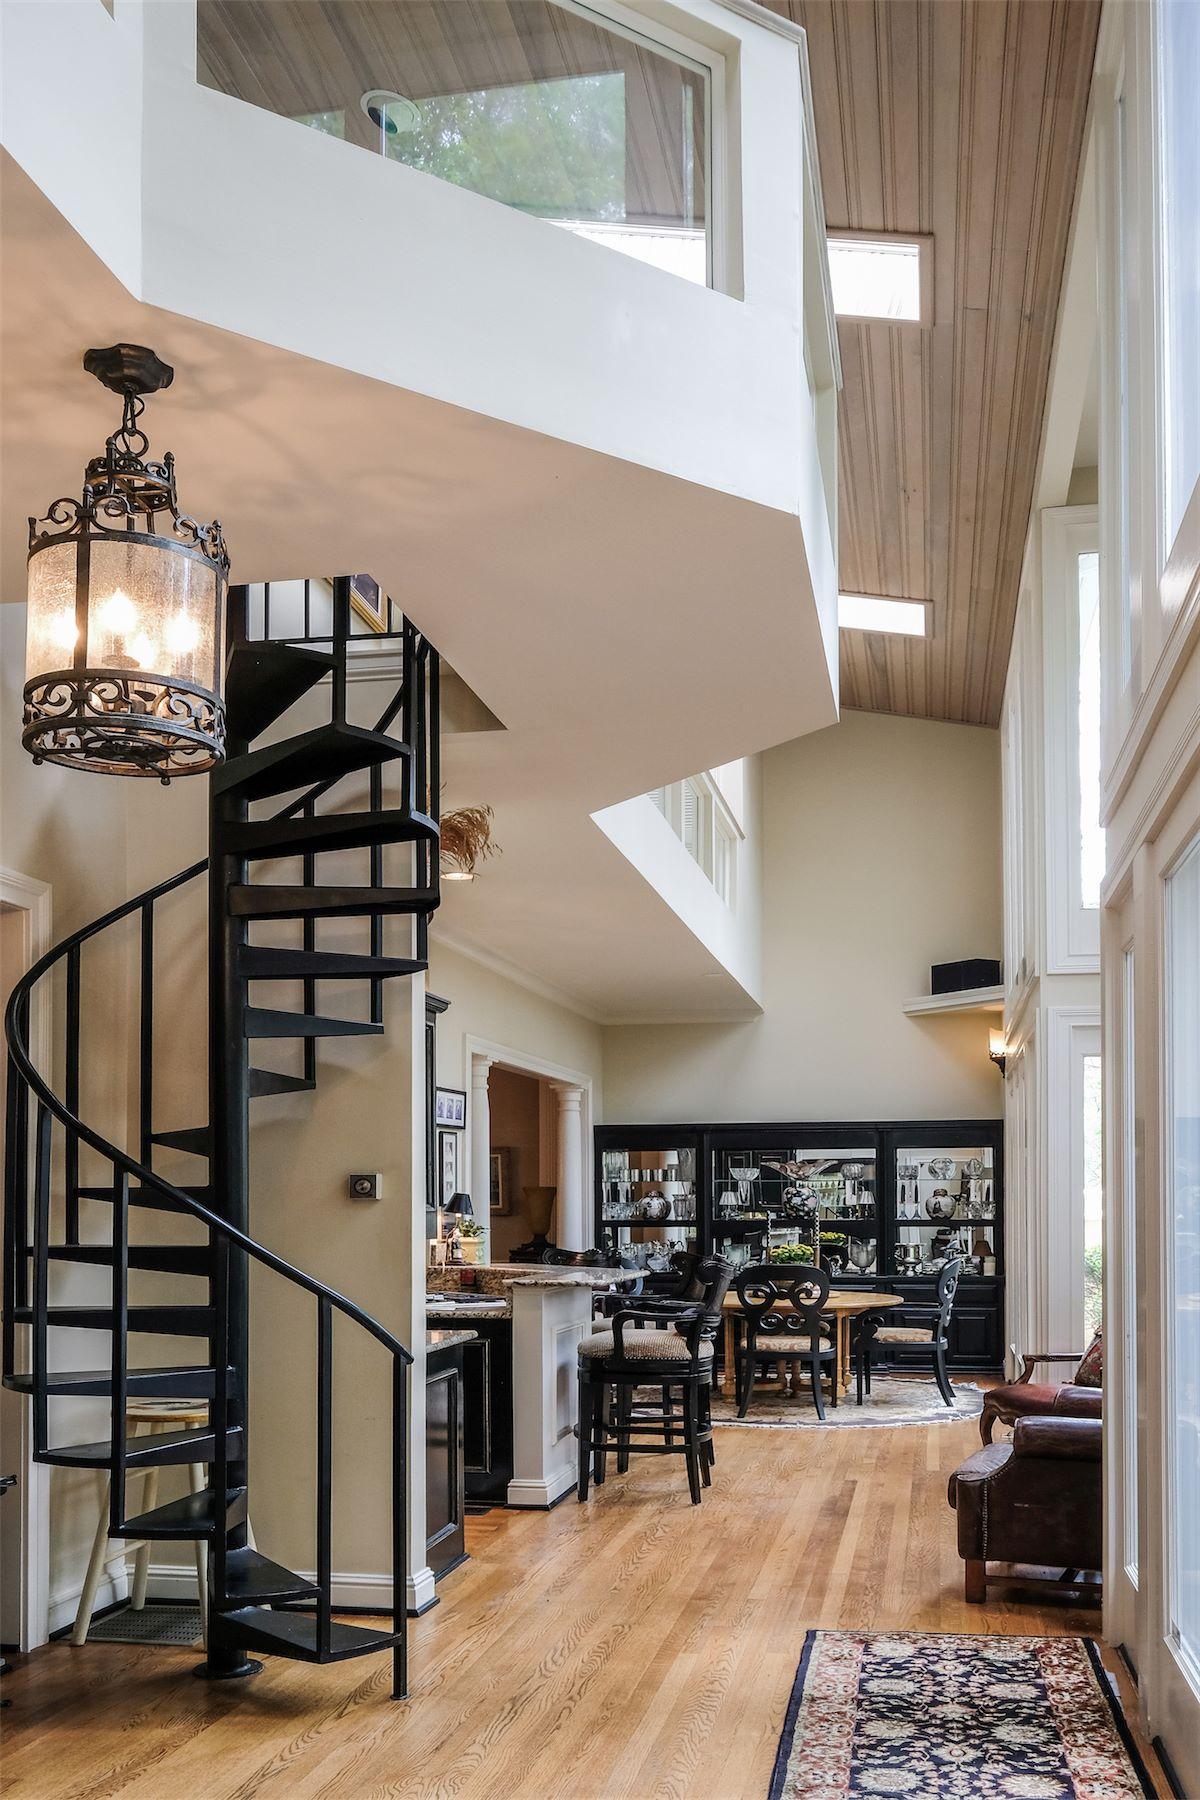 Additional photo for property listing at Stunning Abbottsford Residence 107 Abbottsford Nashville, Tennessee 37215 United States